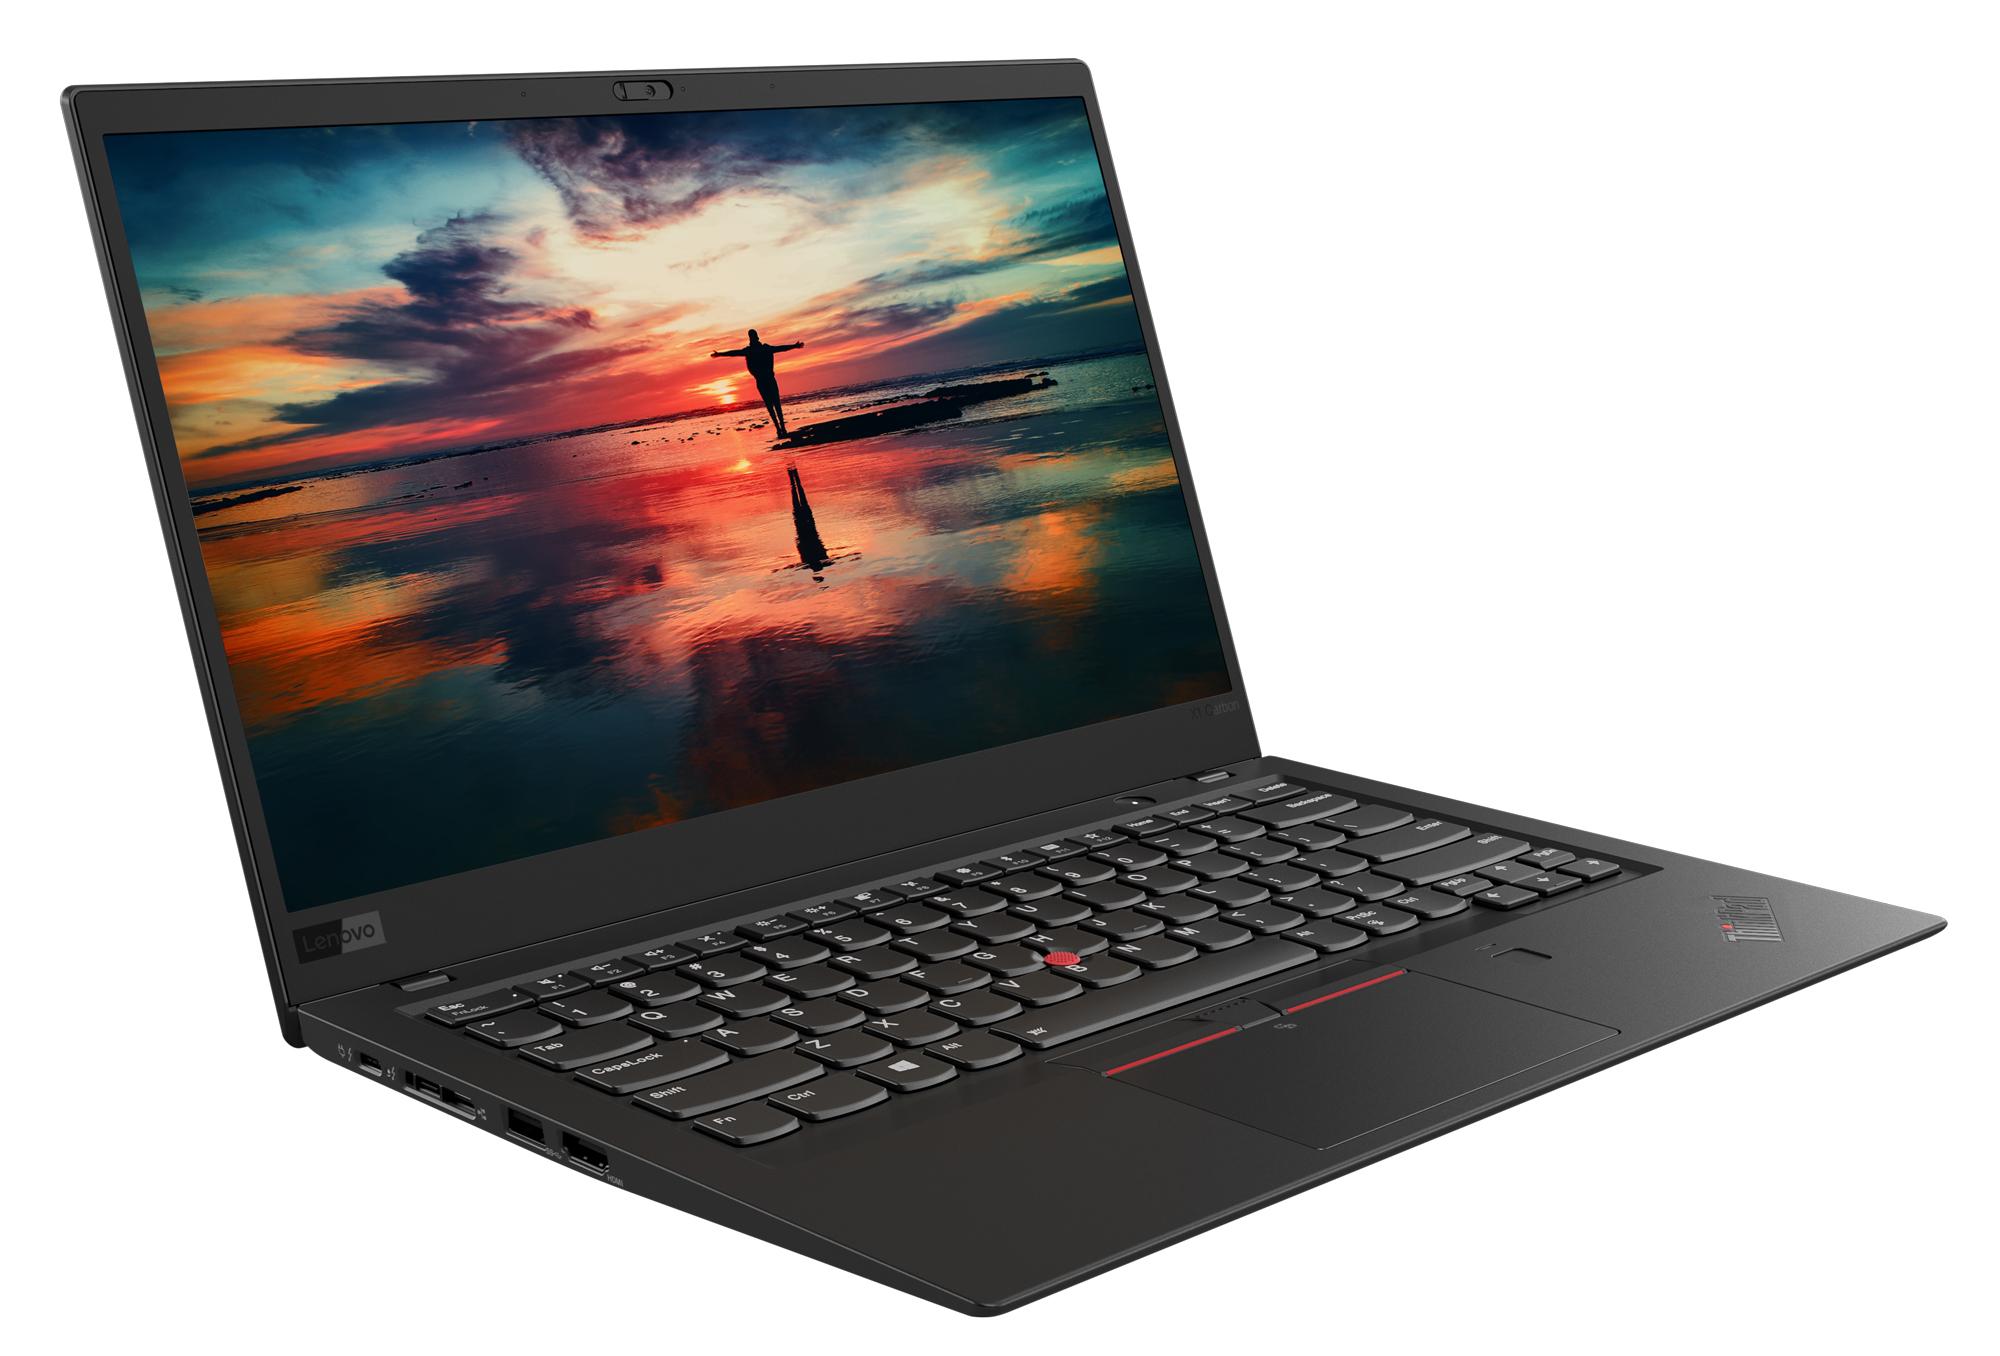 Фото  Ультрабук ThinkPad X1 Carbon 6th Gen (20KH006MRT)